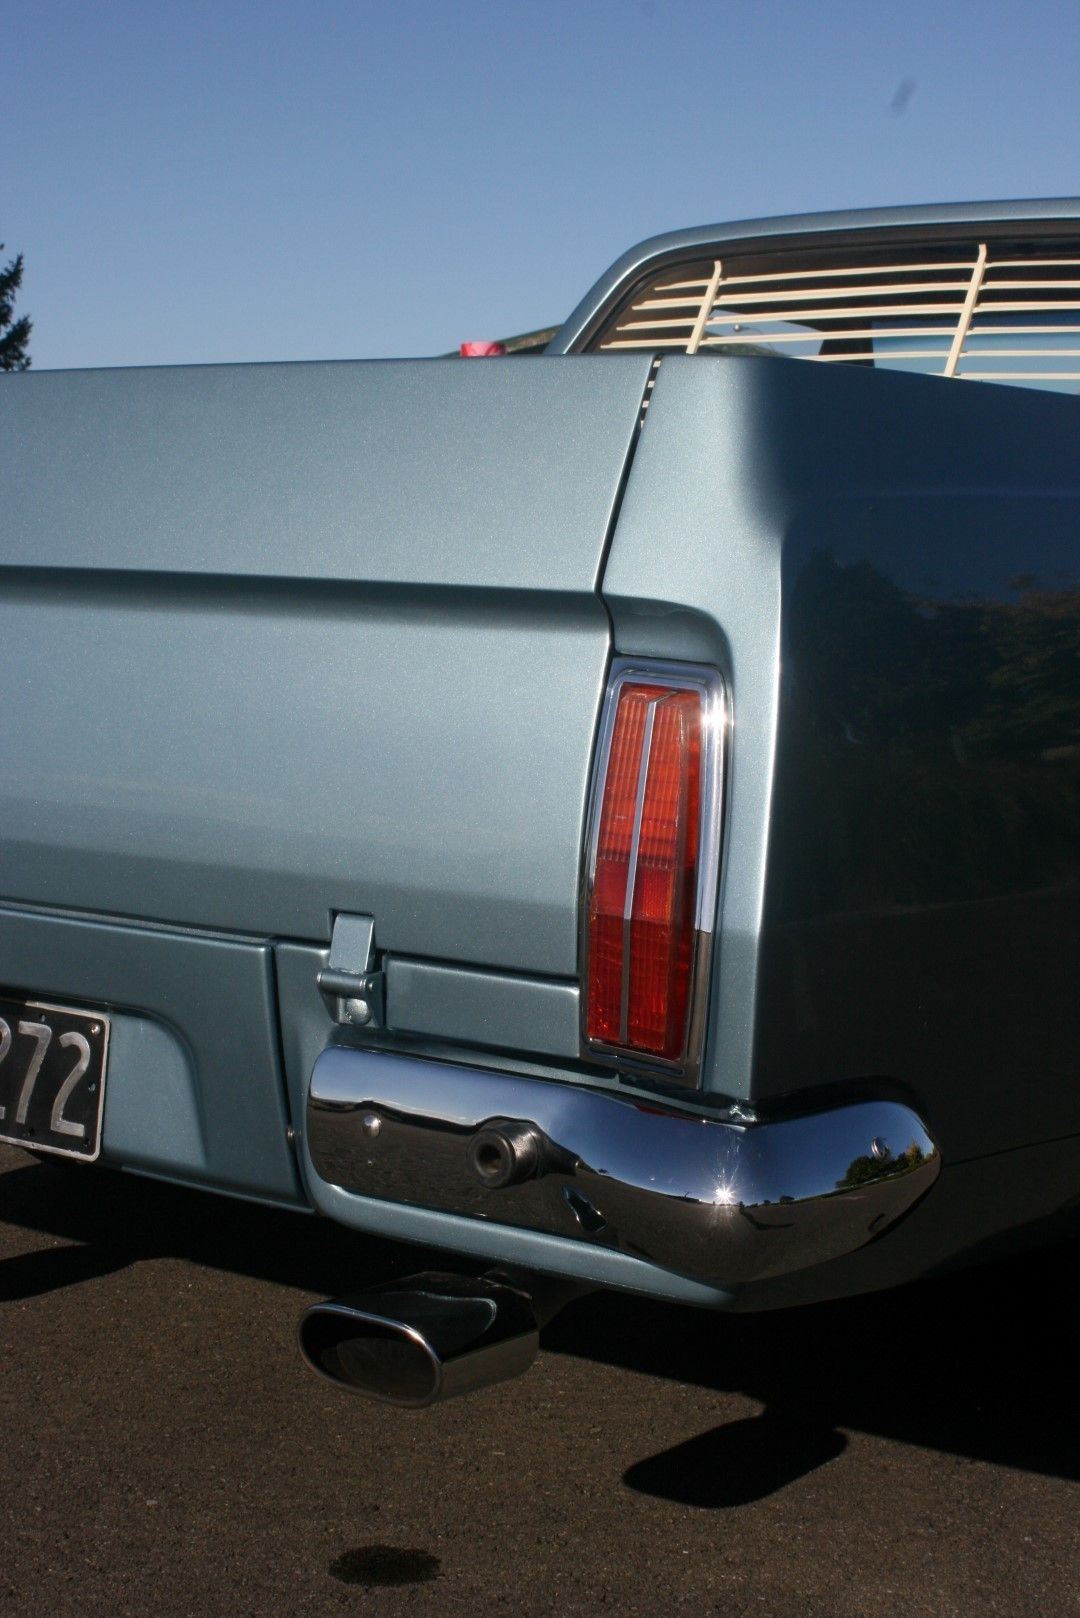 1968 HK Holden Ute Smash Palace Auto Restorations 21.JPG